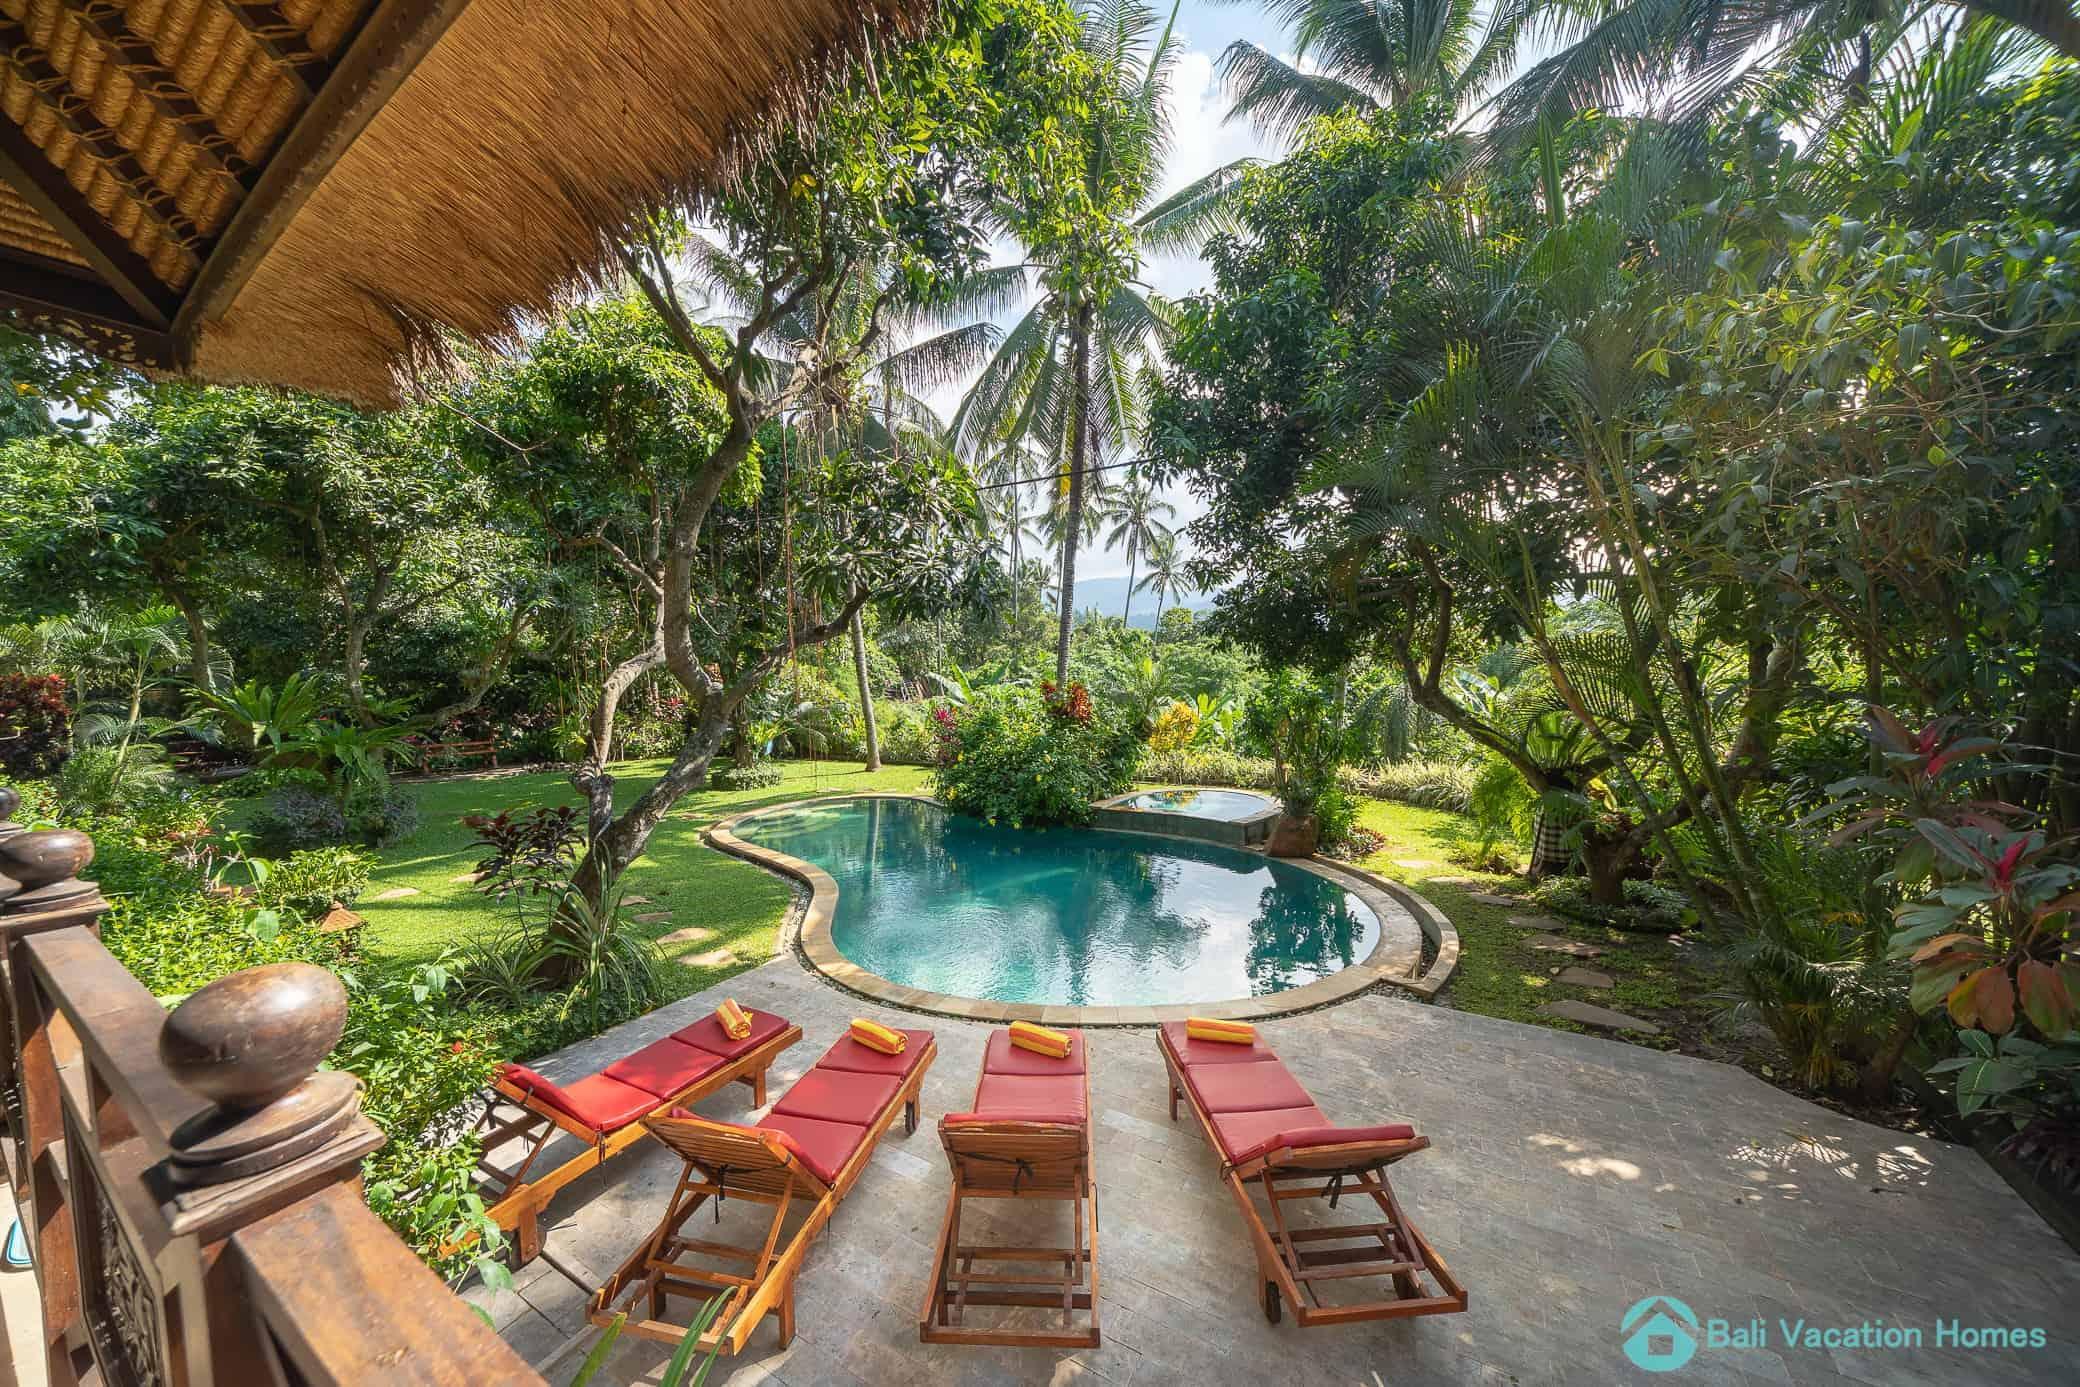 Villa Wana Wonderful Luxury Hideaway Surrounded By Nature Bali Vacation Homes